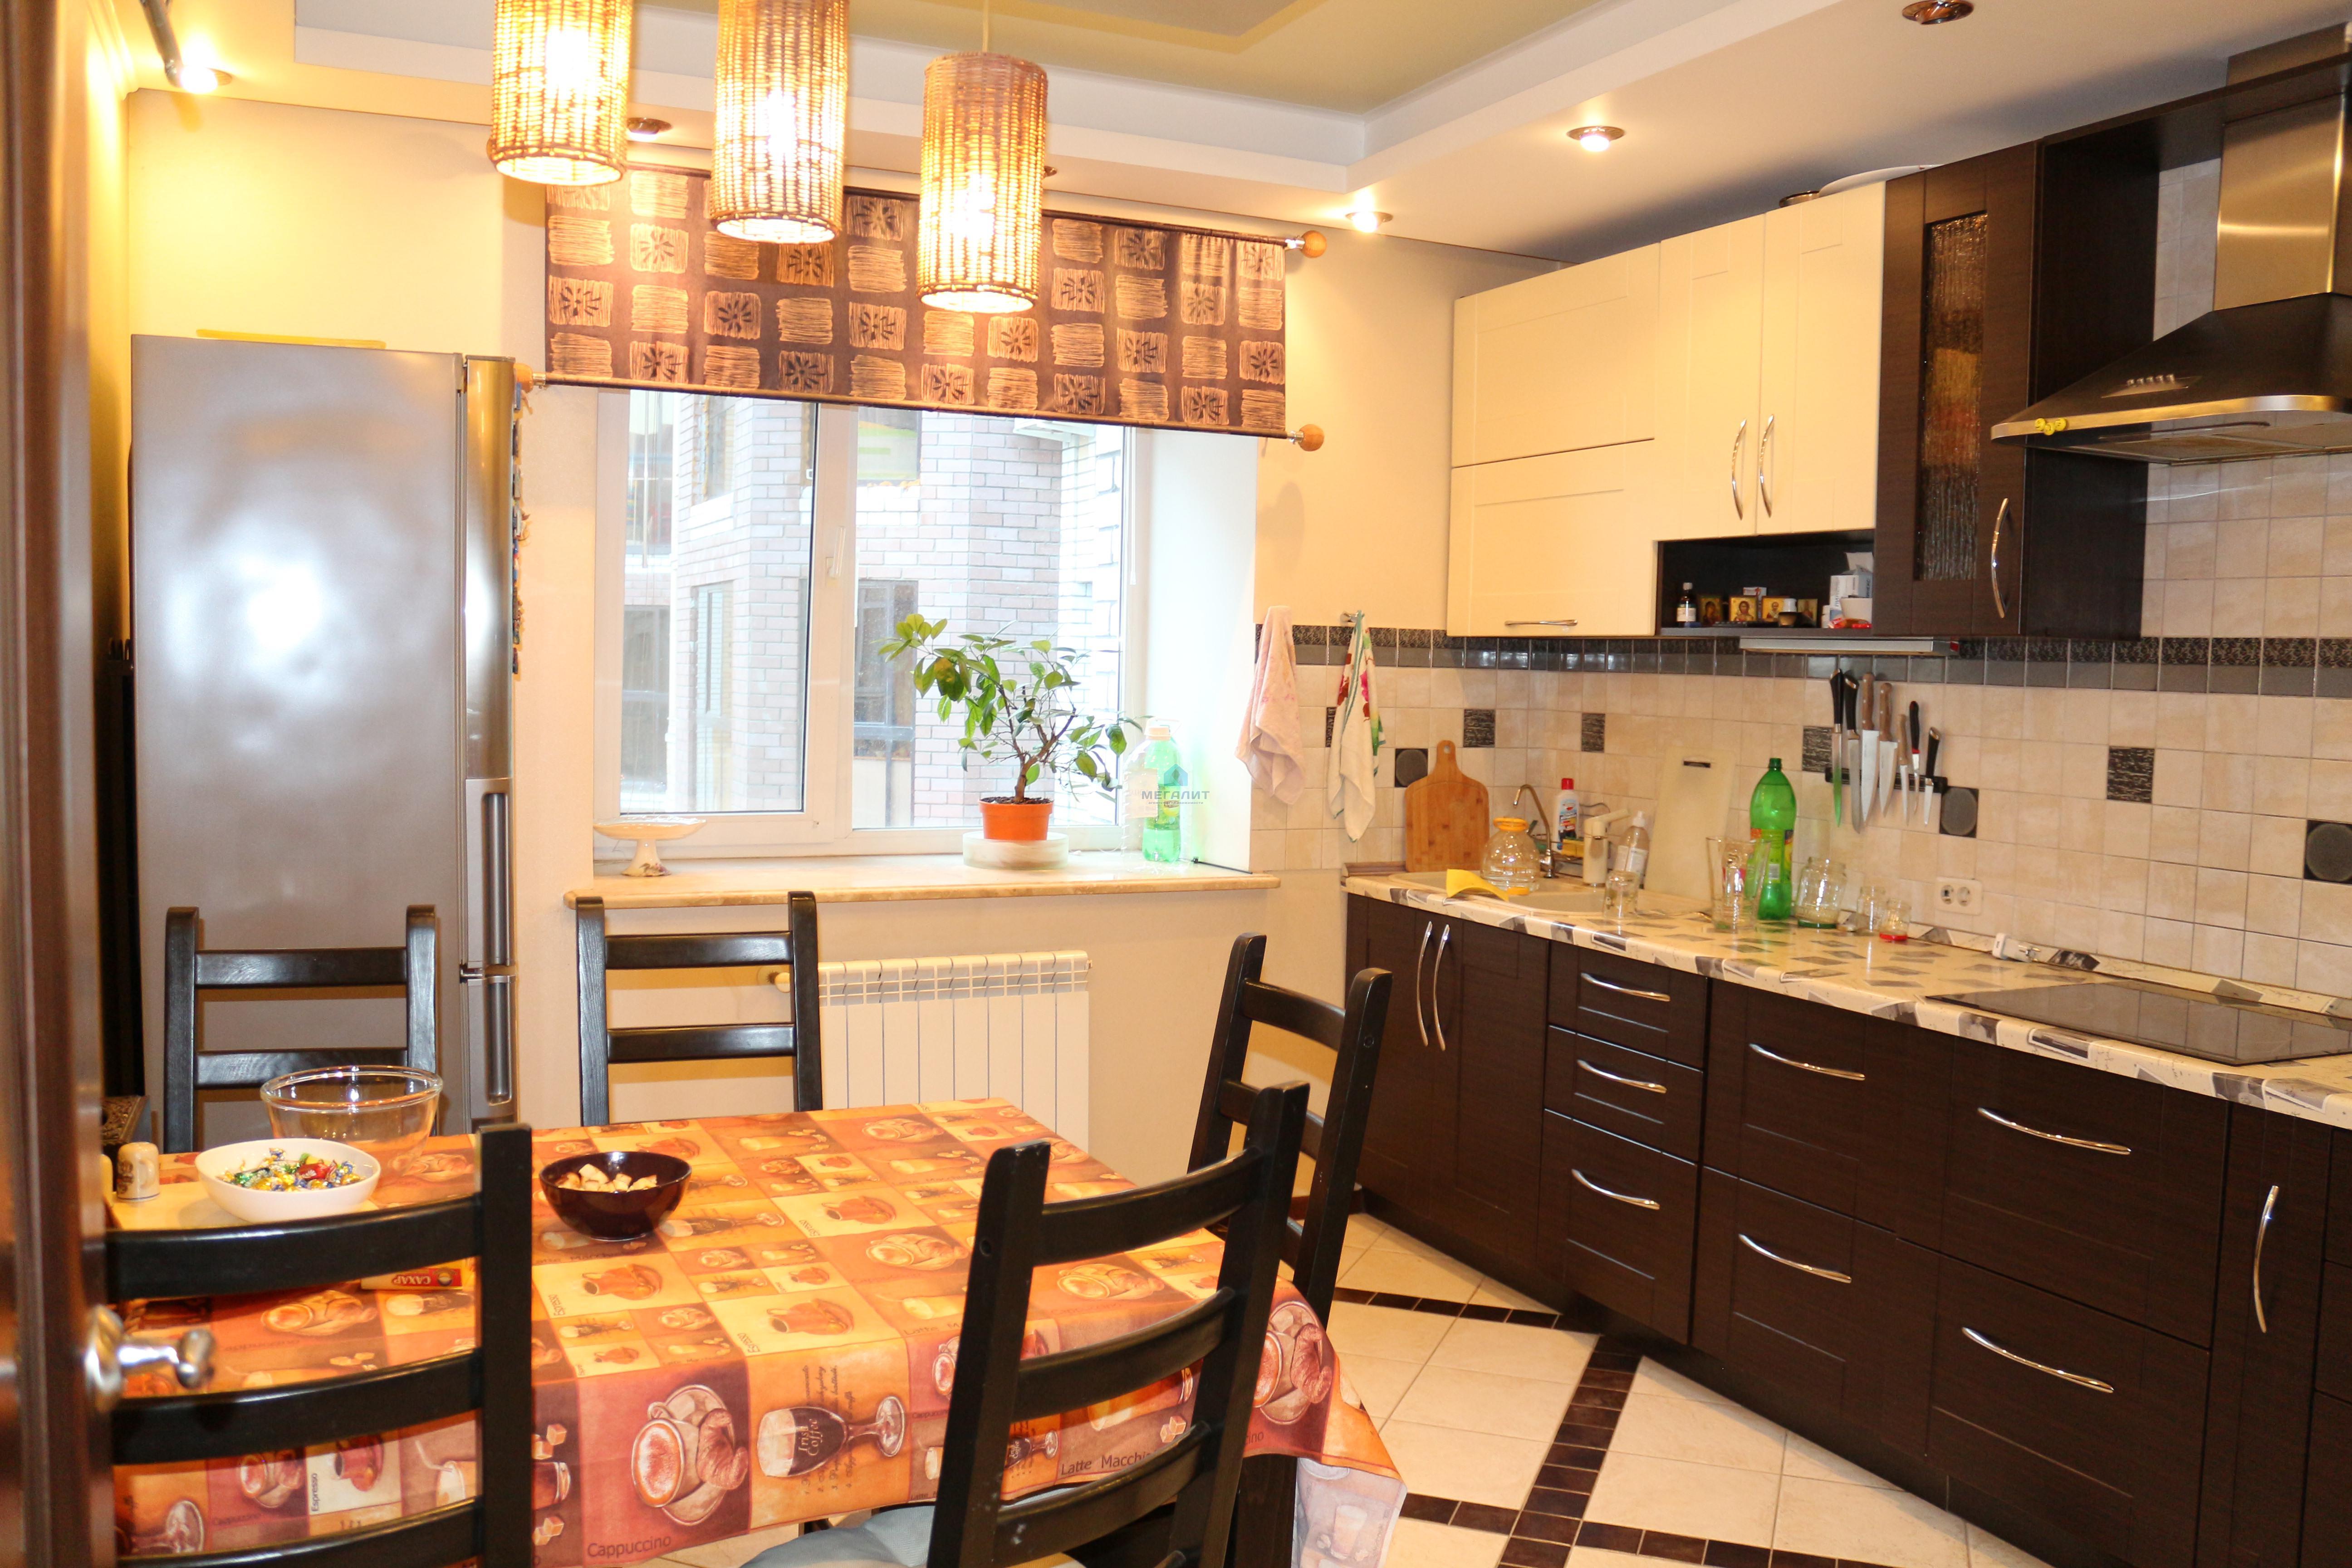 Продажа 3-к квартиры Мидхата Булатова 5, 105.0 м² (миниатюра №5)